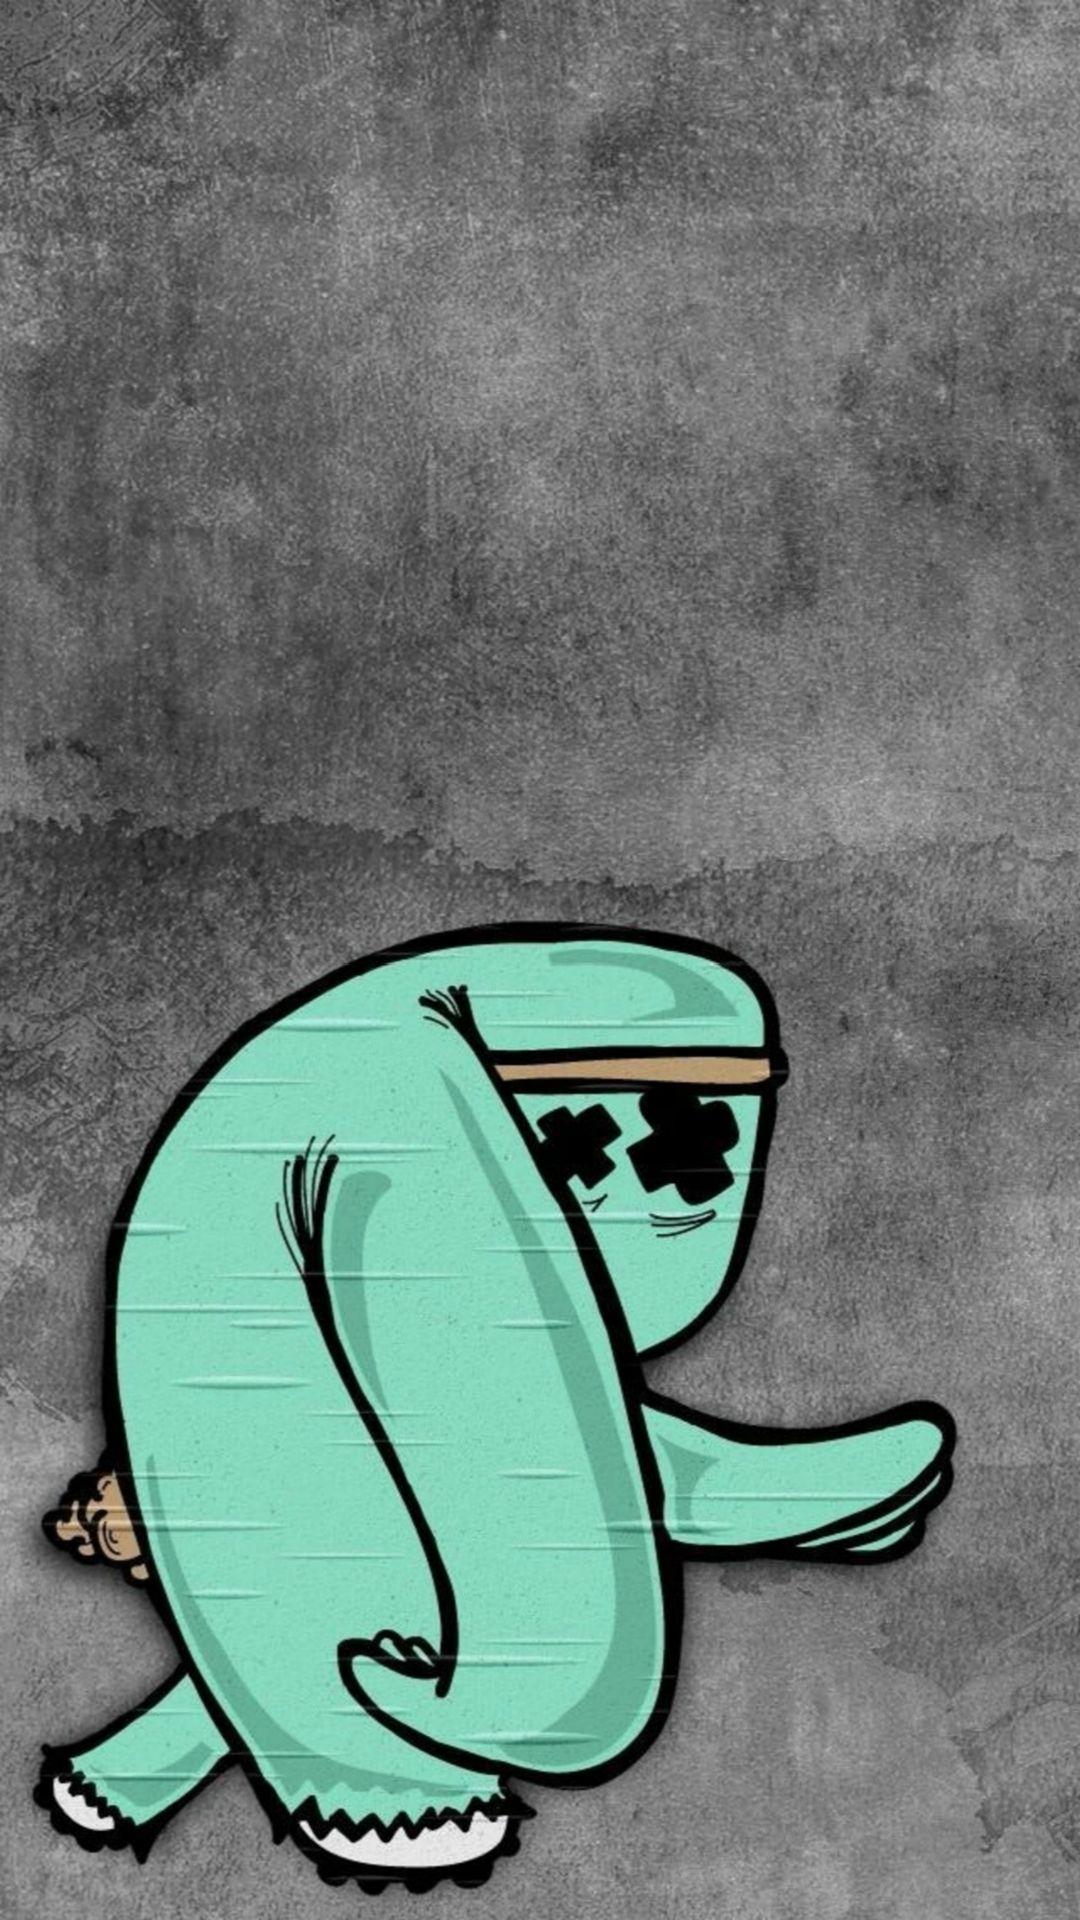 Abstract Fun Cartoon Art iPhone 8 Wallpapers   Apple ...